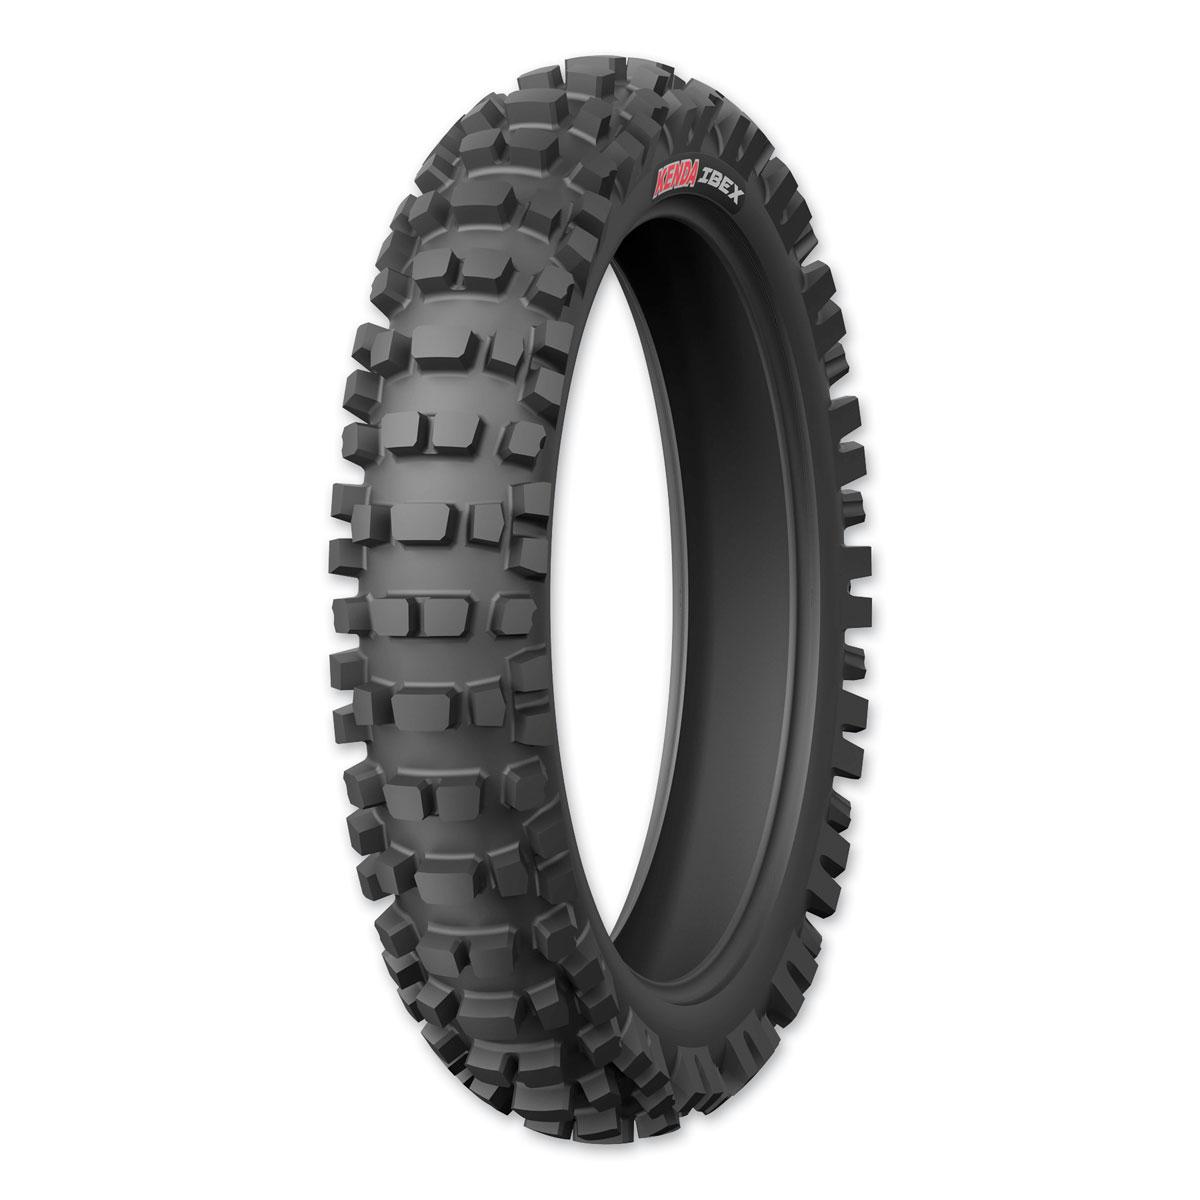 Kenda Tires K774 110/100-18 Rear Tire   160-1752   J&P Cycles